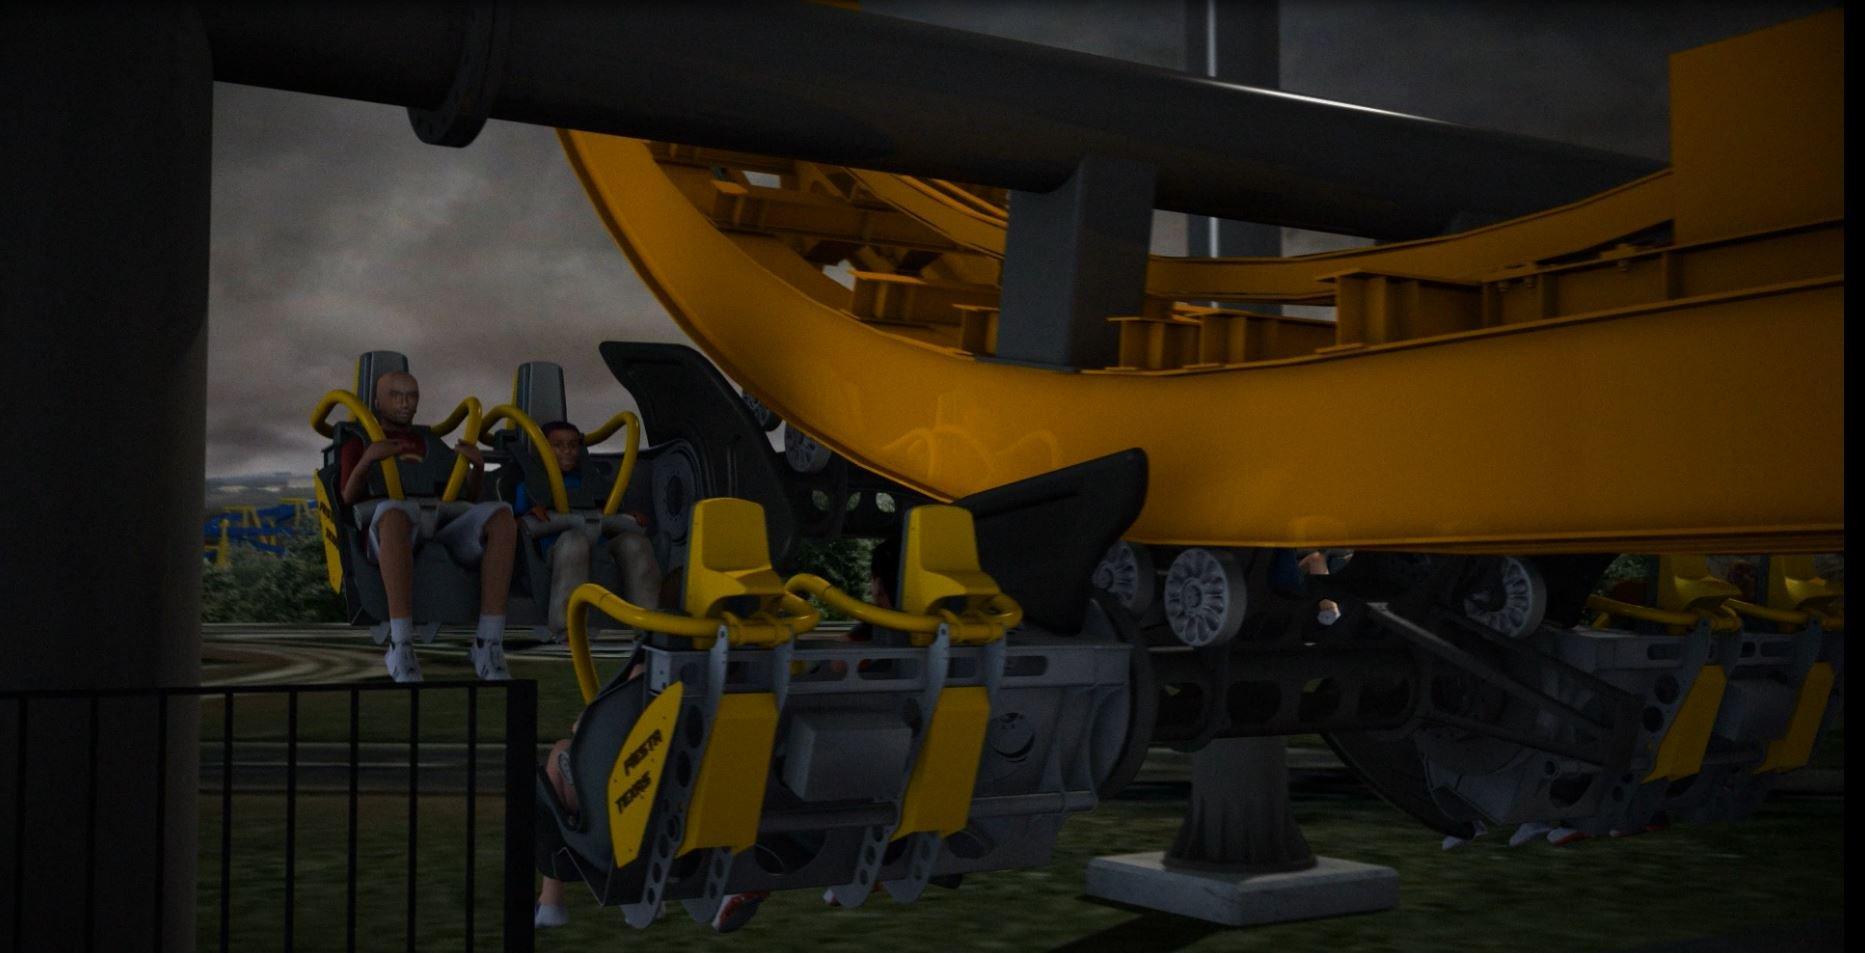 Six Flags Fiesta Texas - Batman Cars